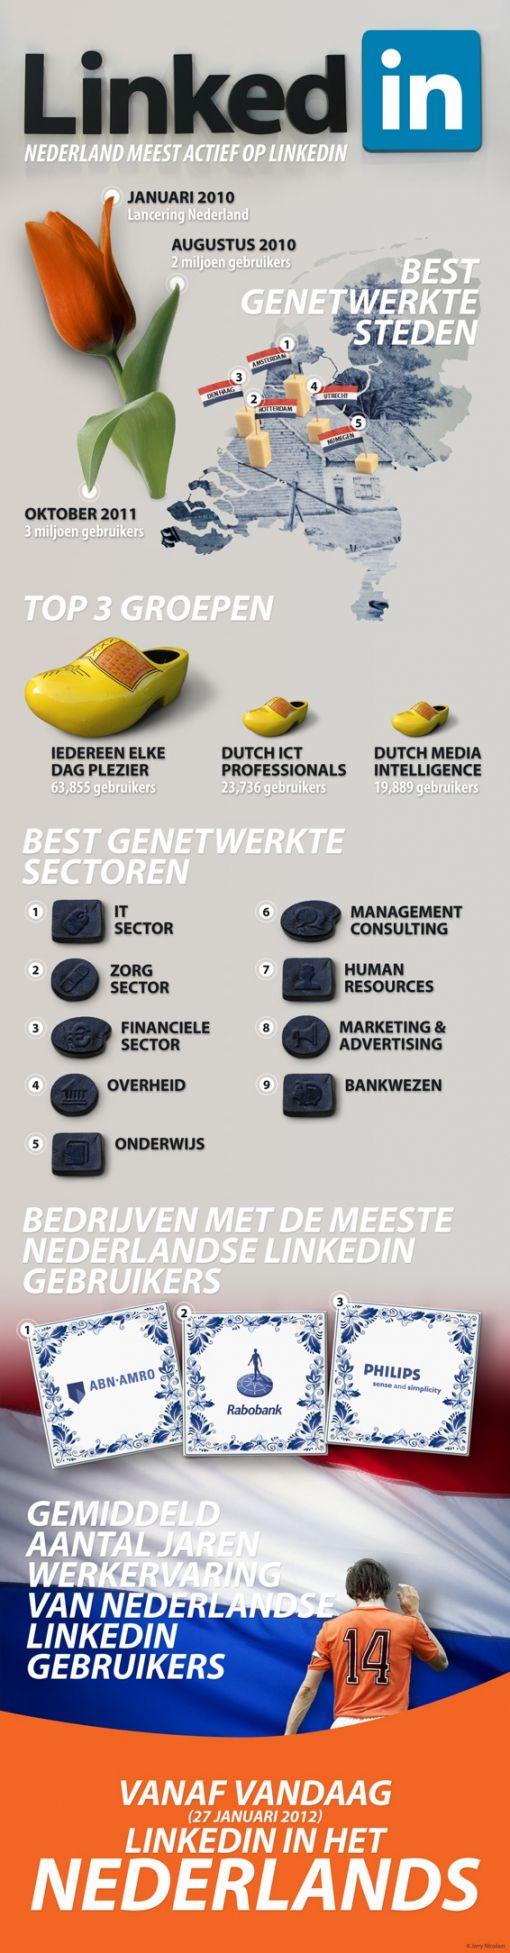 infographic-nl-li